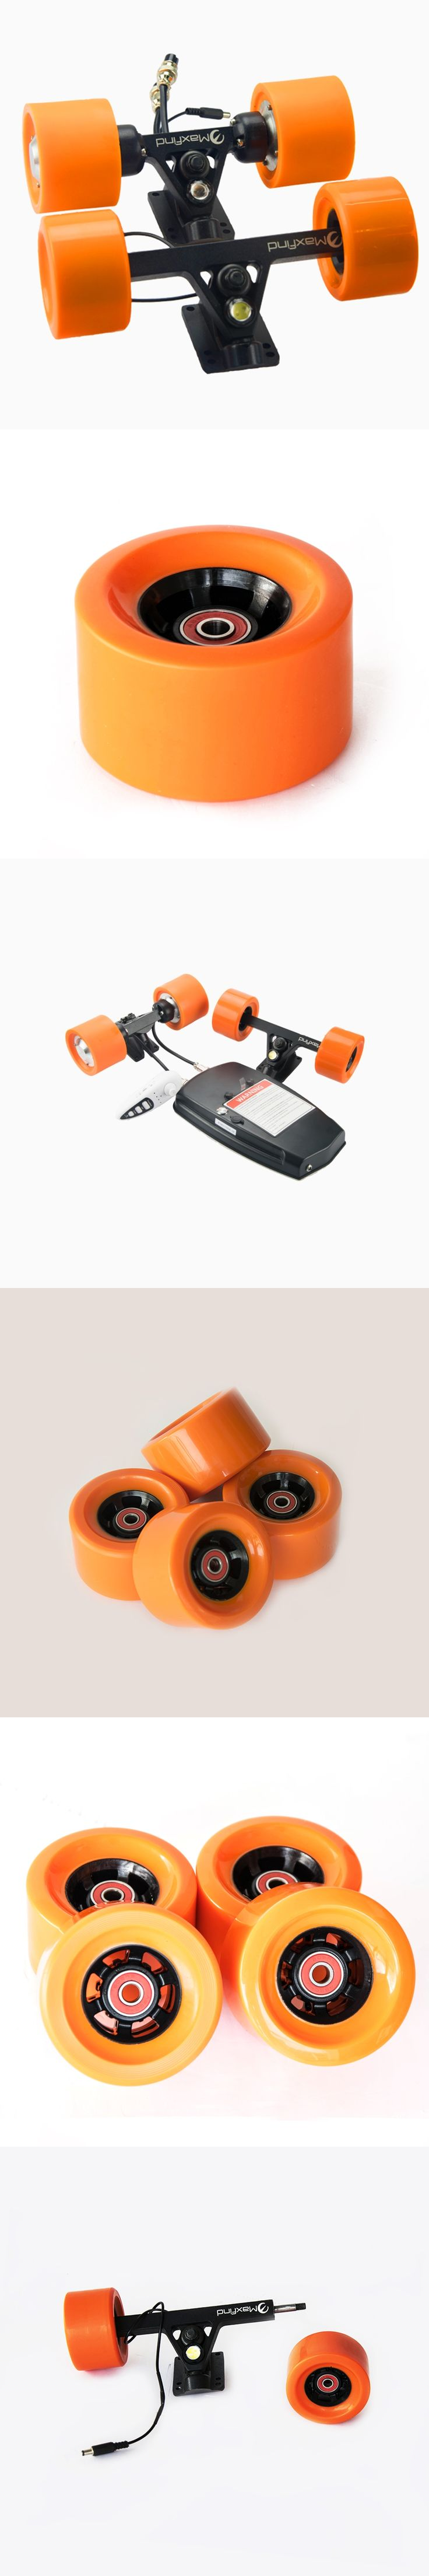 New Orange Color Wheels 1/2/3/4pcs Skateboard Bearings Smooth Riding Durable Longboard Wheels Professional Skate Board